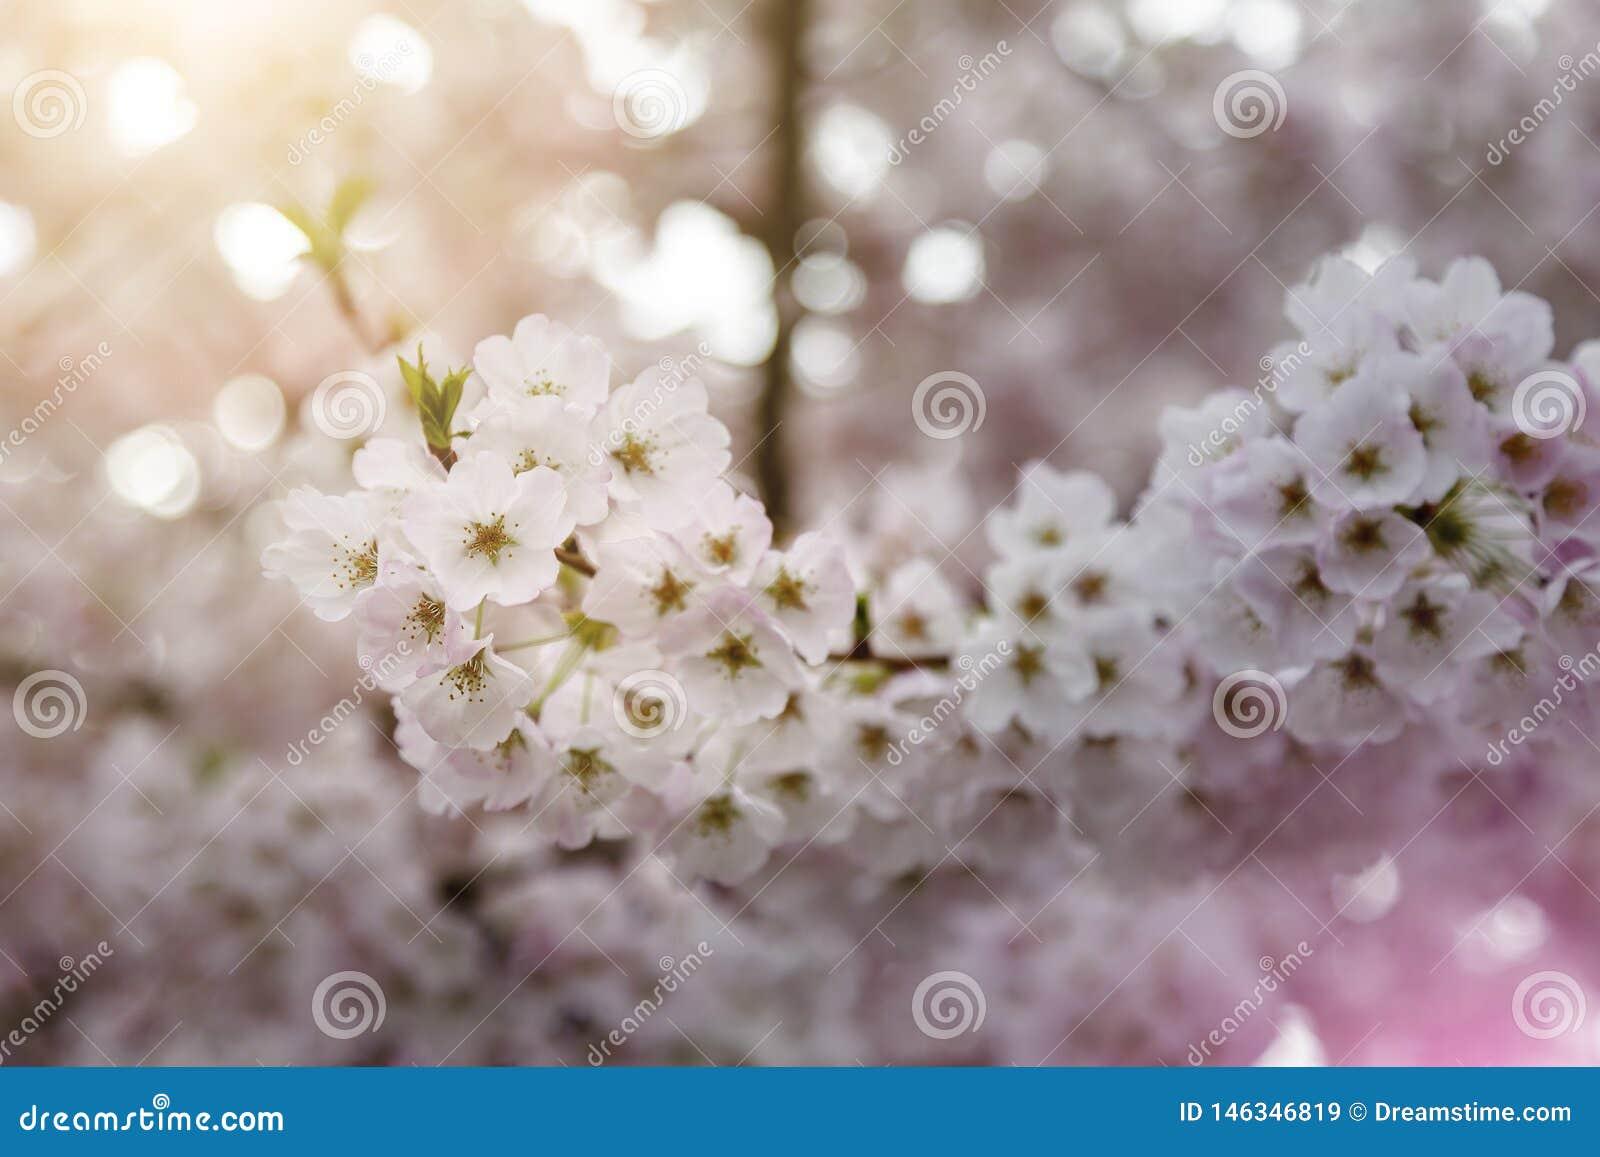 Close-upmacro van de Lente Cherry Blossoms, lichtrose kleurings warm zonlicht Bokeh